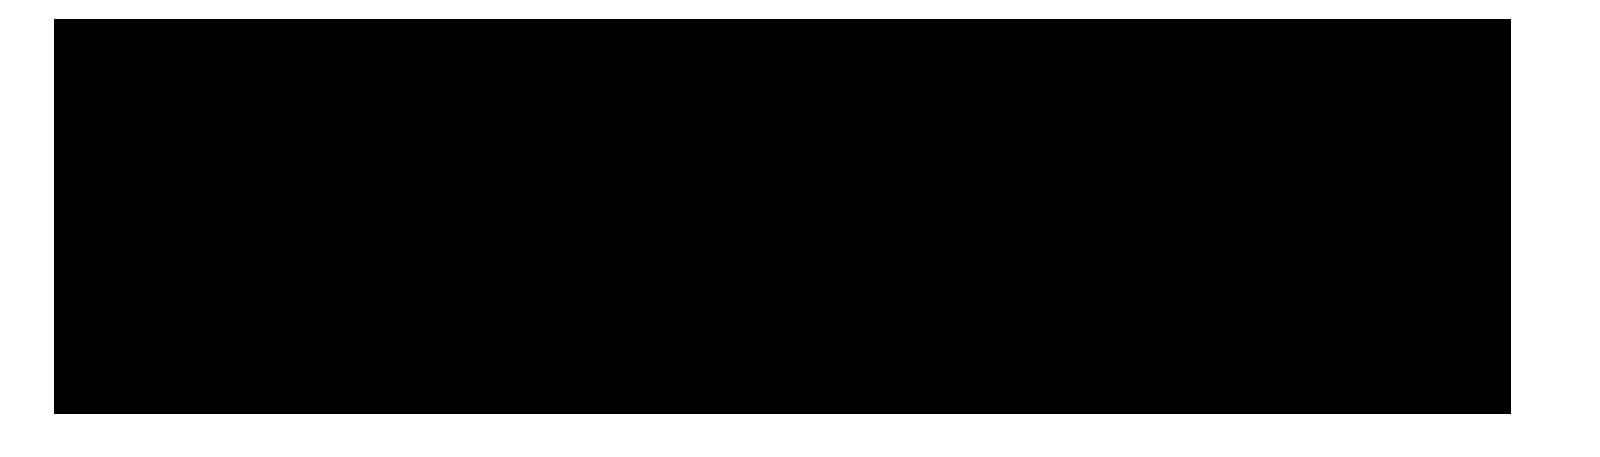 zasuni_pozicija-03